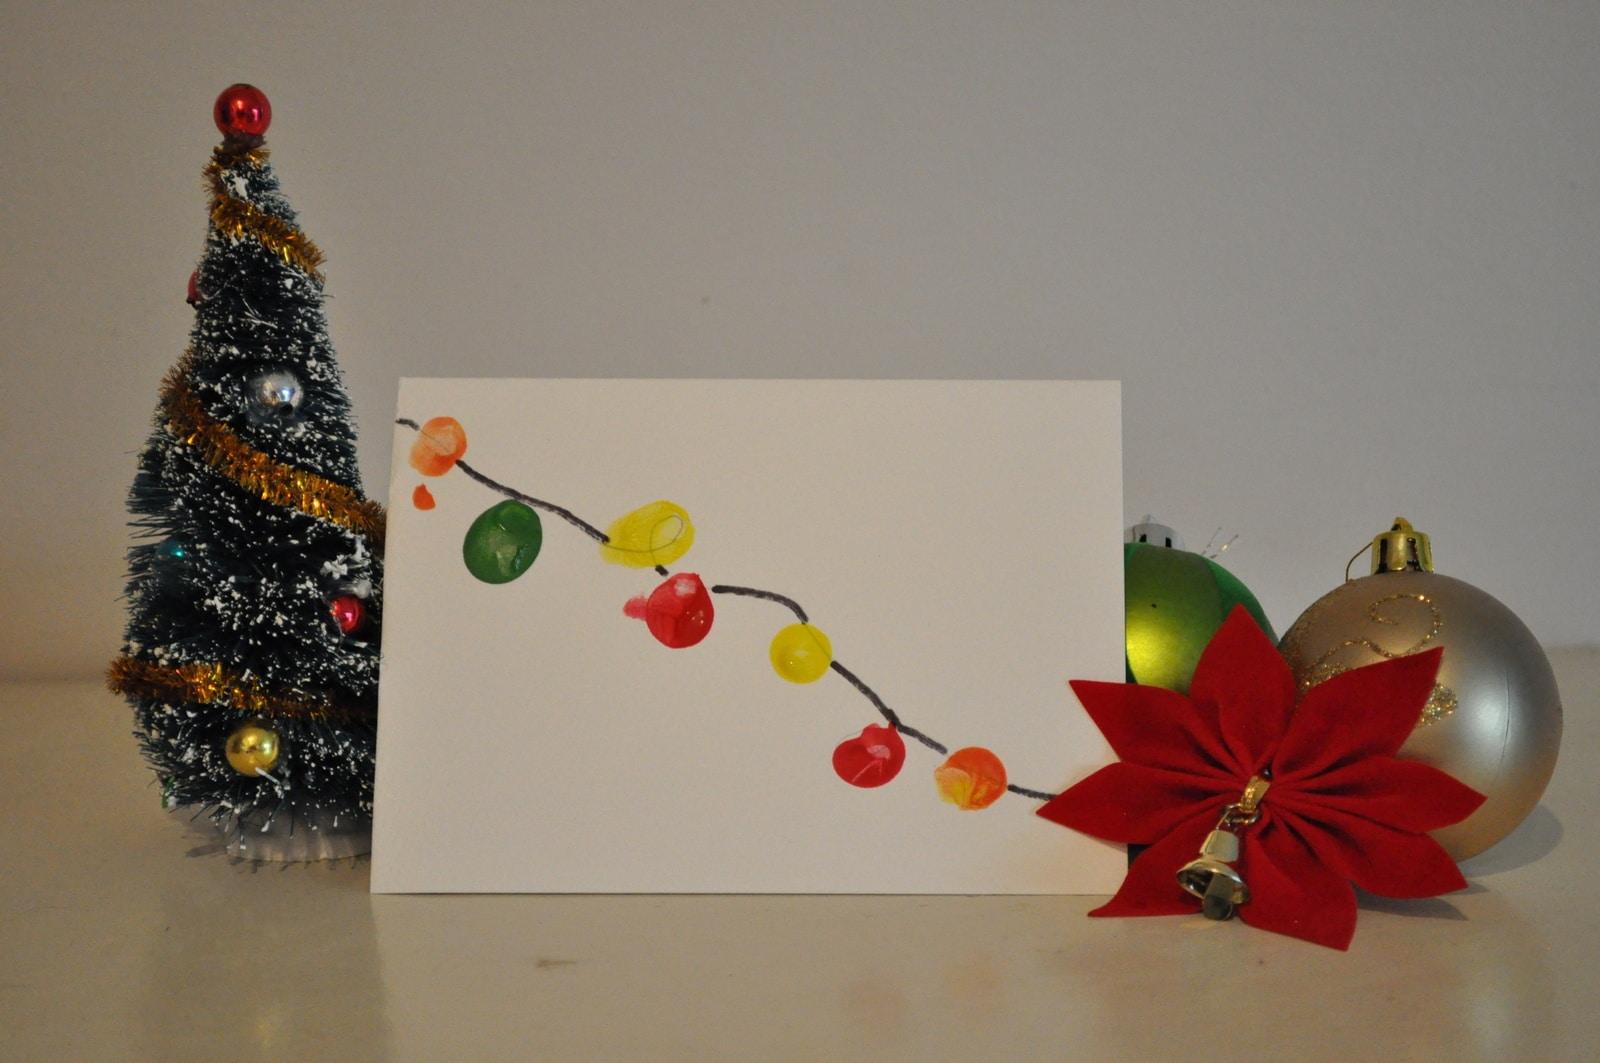 Homemade christmas card ideas to do with kids for Christmas cards made